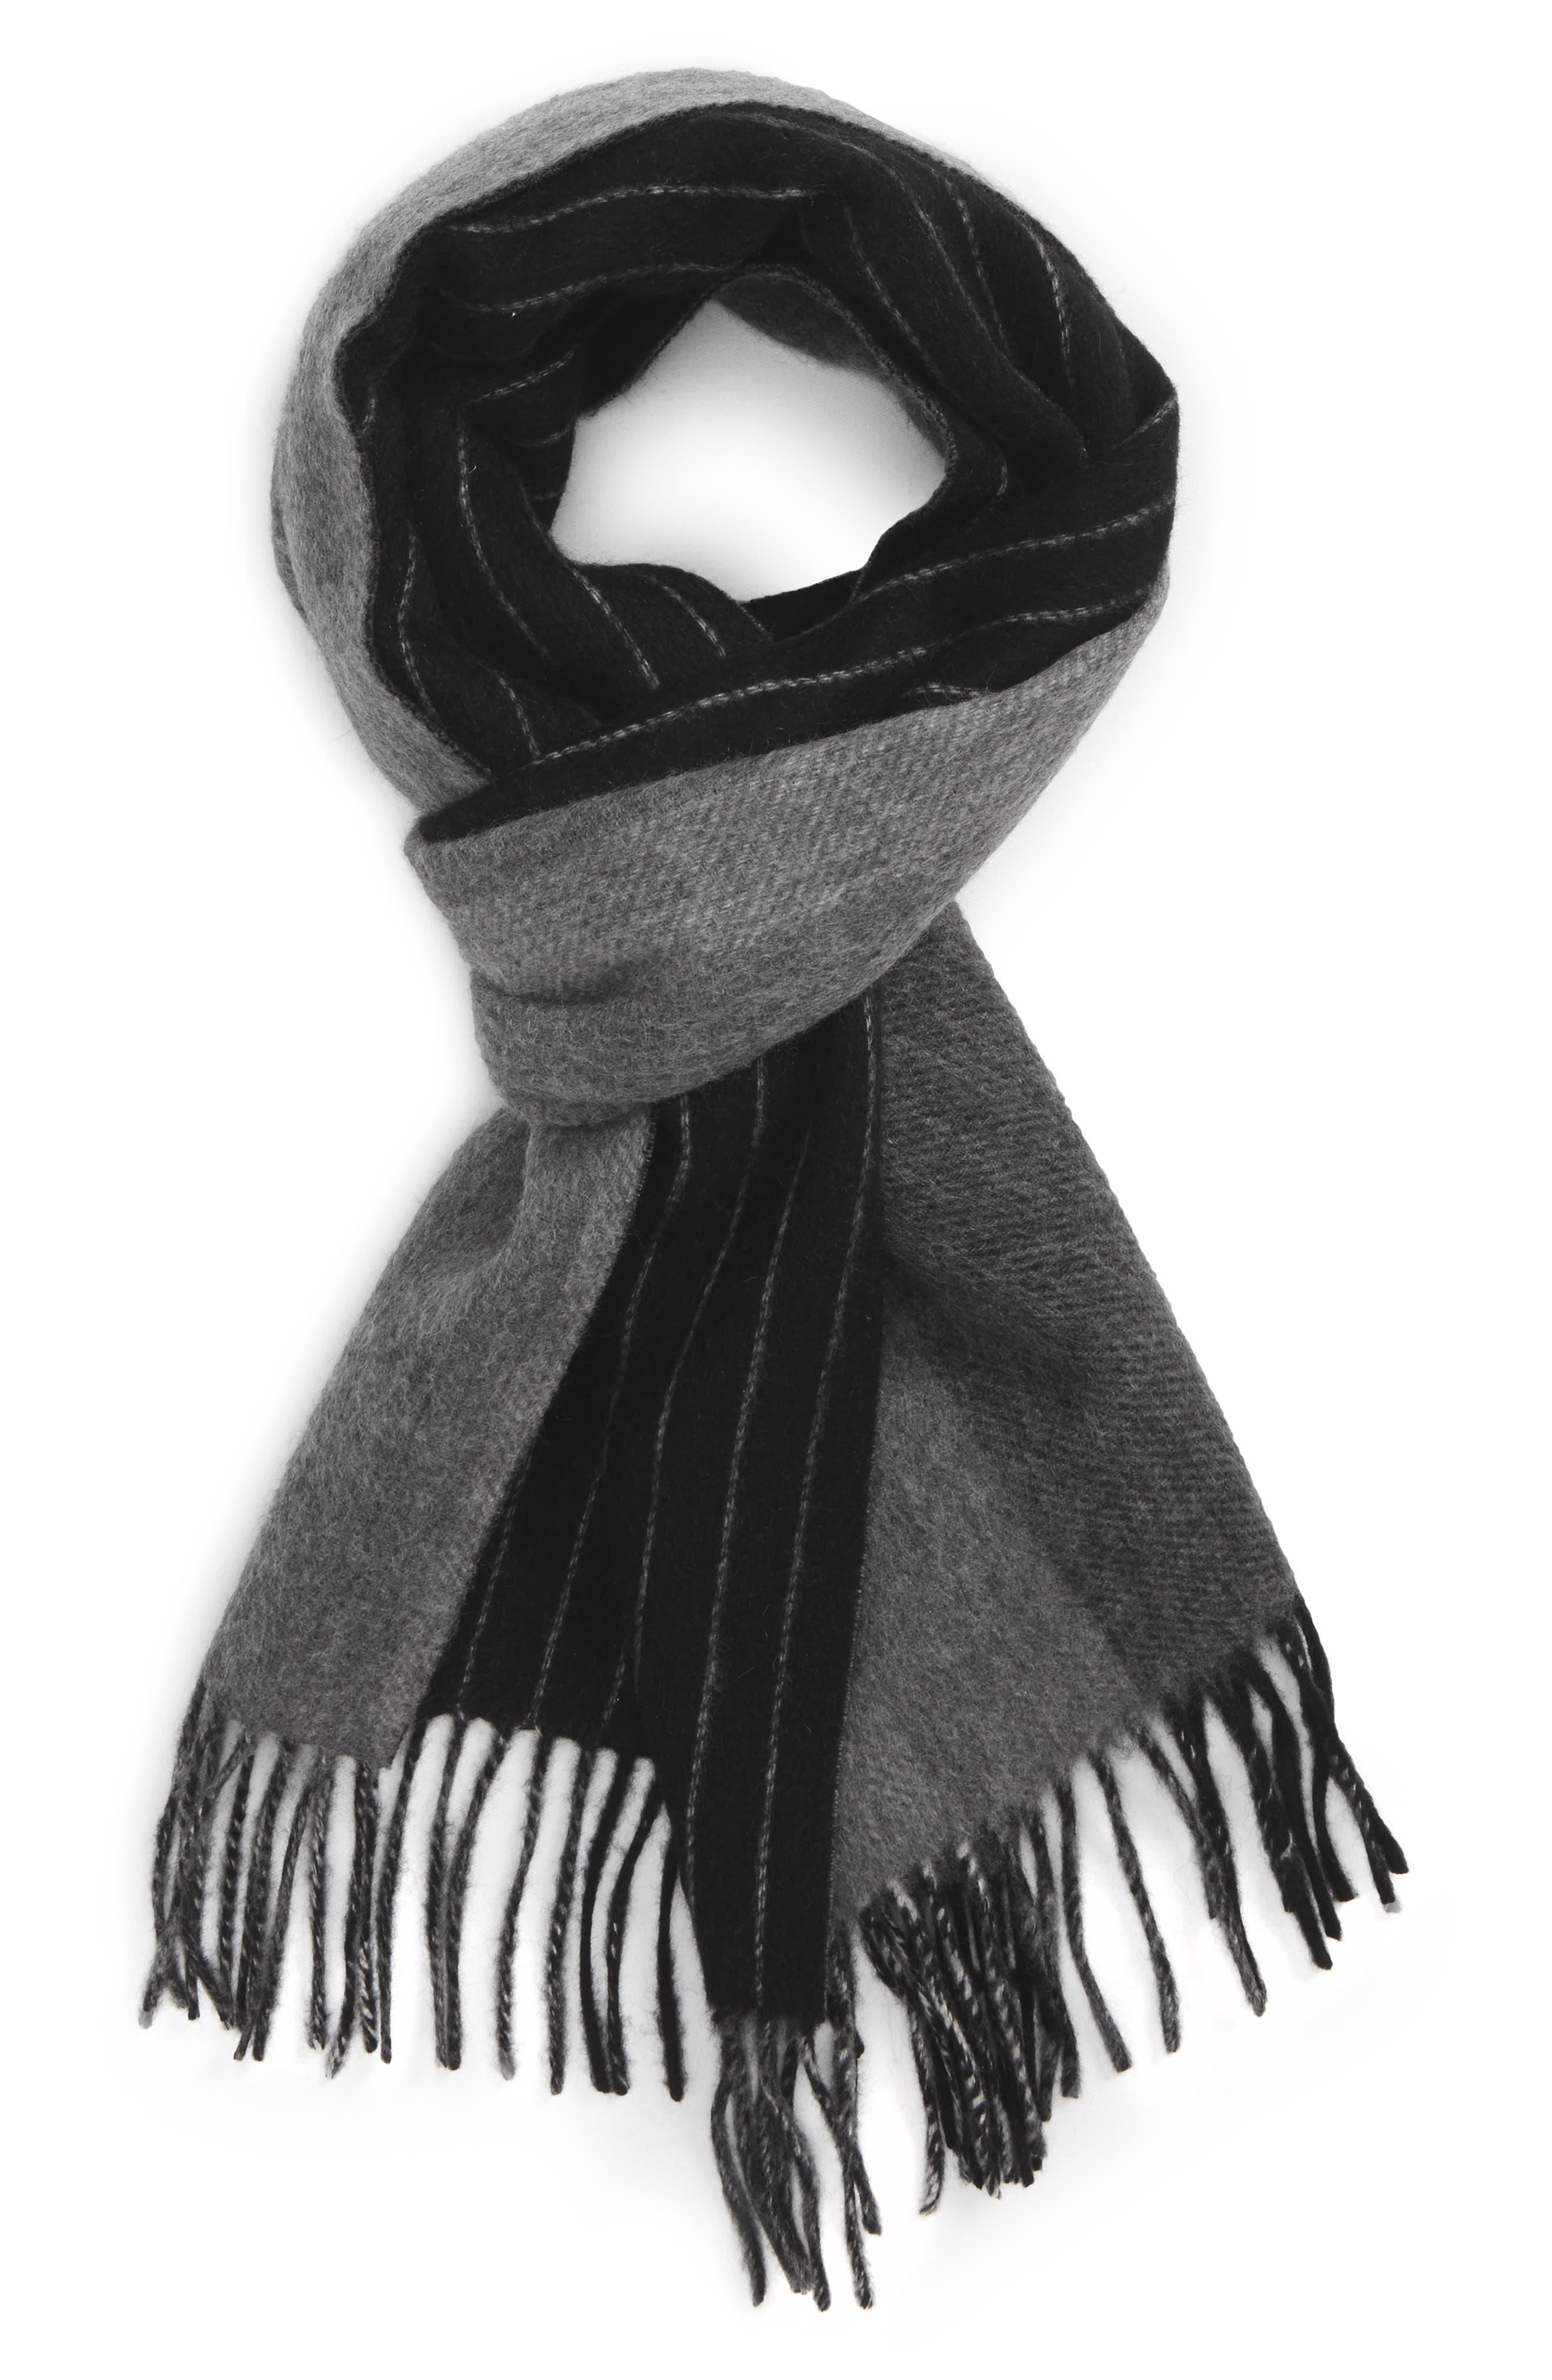 Pinstripe Cashmere Scarf,                         Main,                         color, Black/ Grey